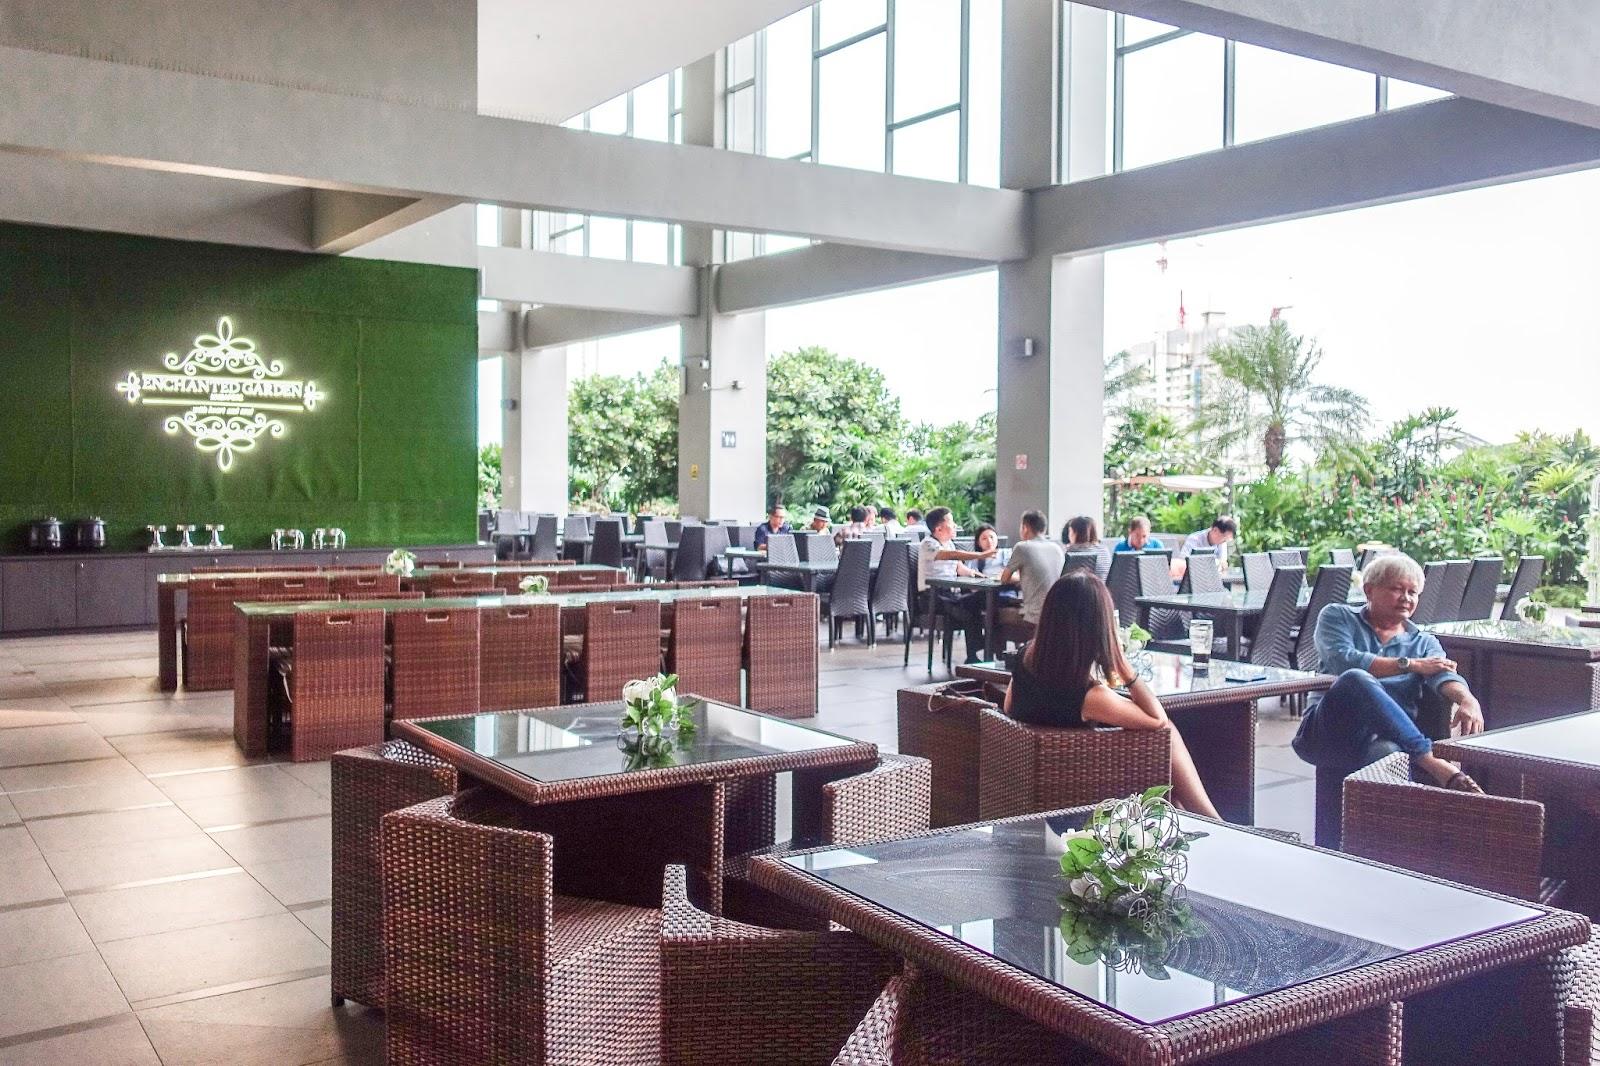 5 Reasons To Visit The Enchanted Garden Cafe In June Joysofyz Yuji S Budget Story